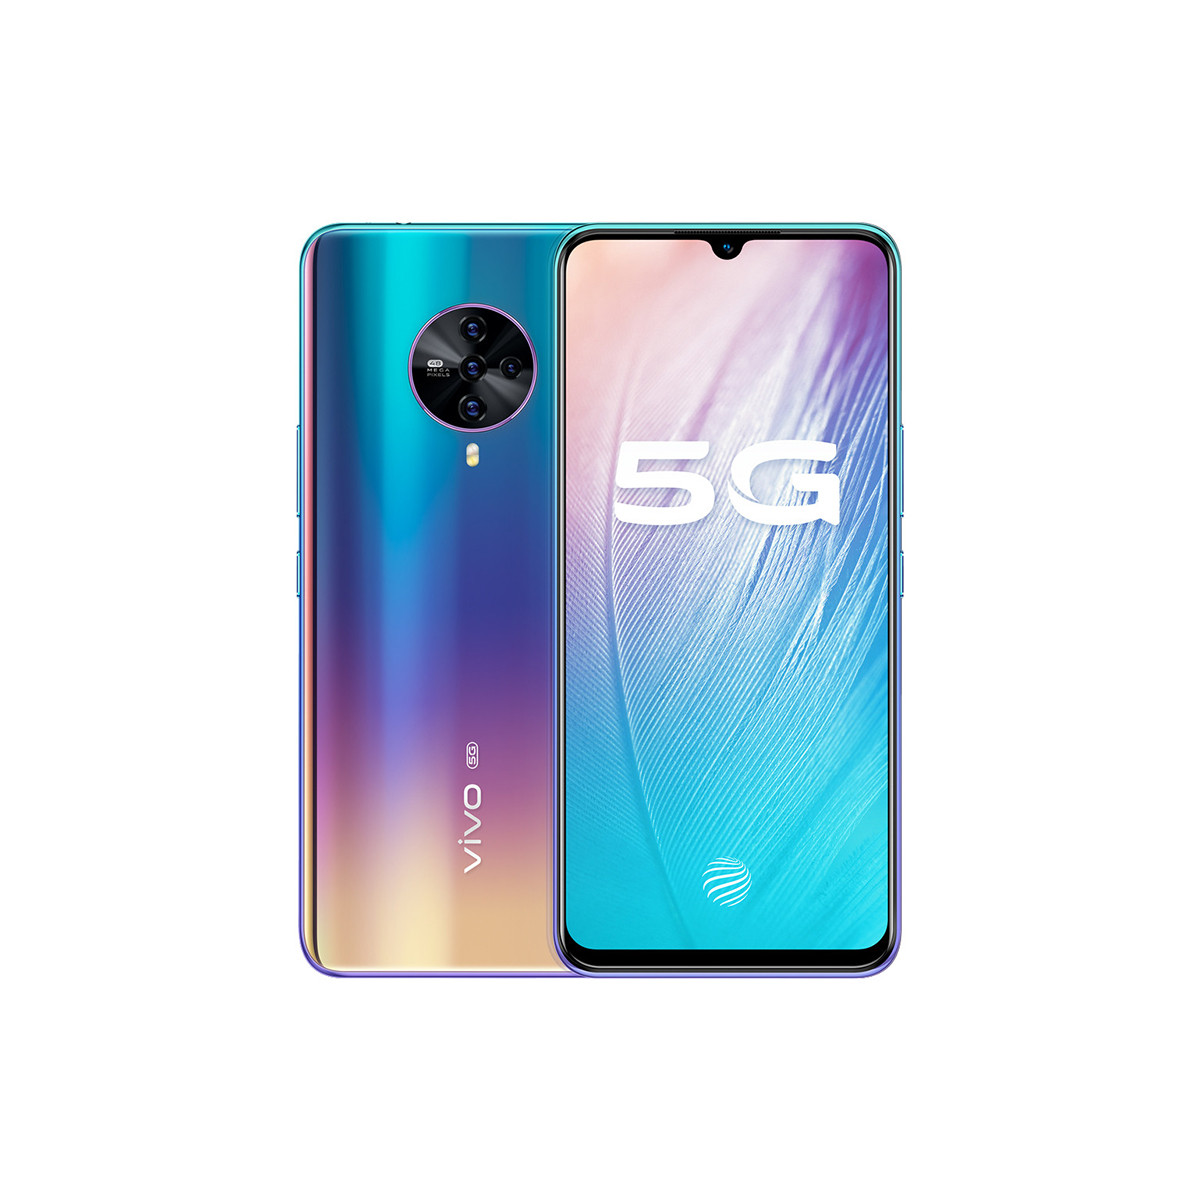 vivovivo【新品速发】S6双模5G 4800W超级四摄拍照手机S6-8G-128G-流光秘境